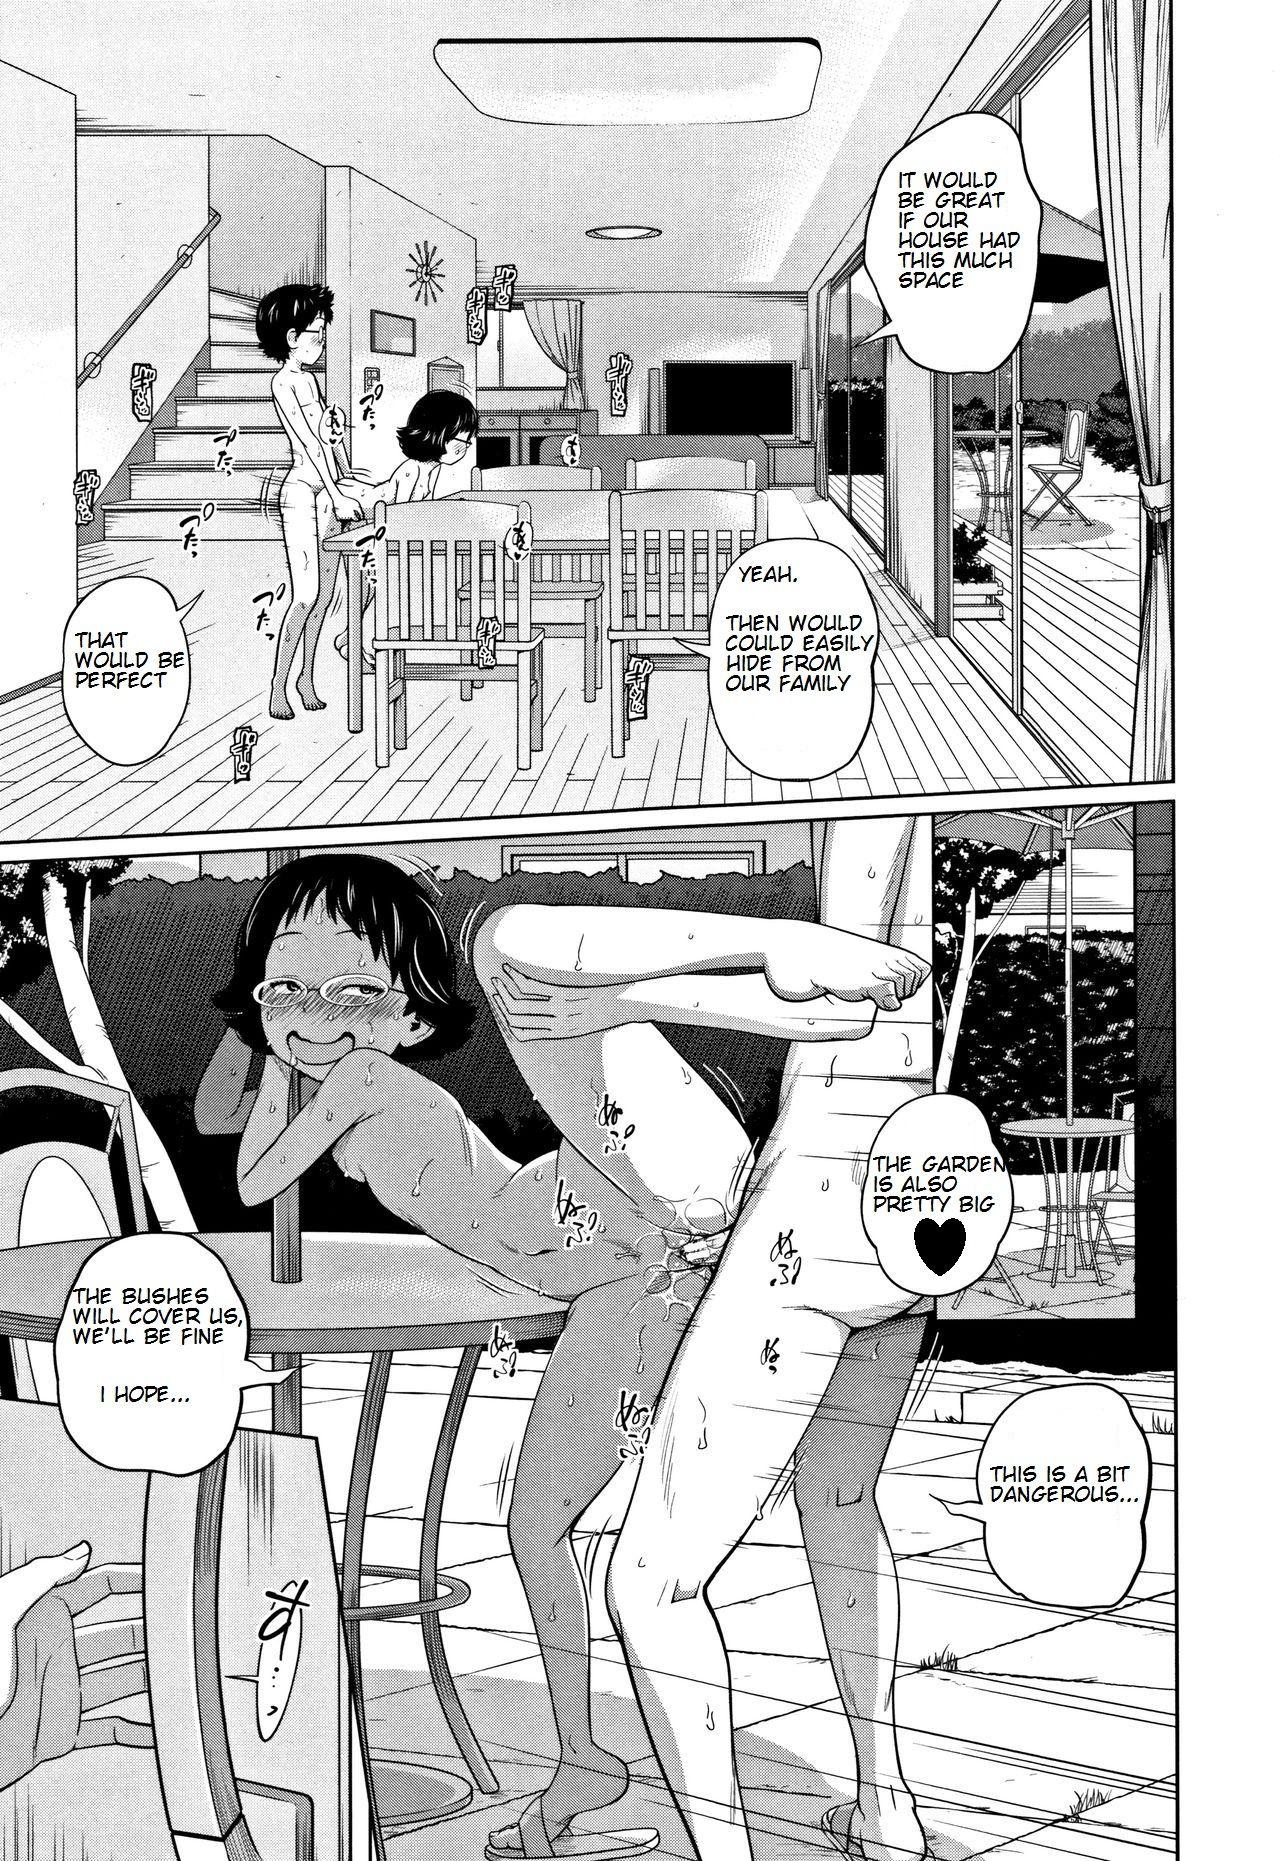 Tomodachi n uchi de orusuban | Looking after a friend's house 24